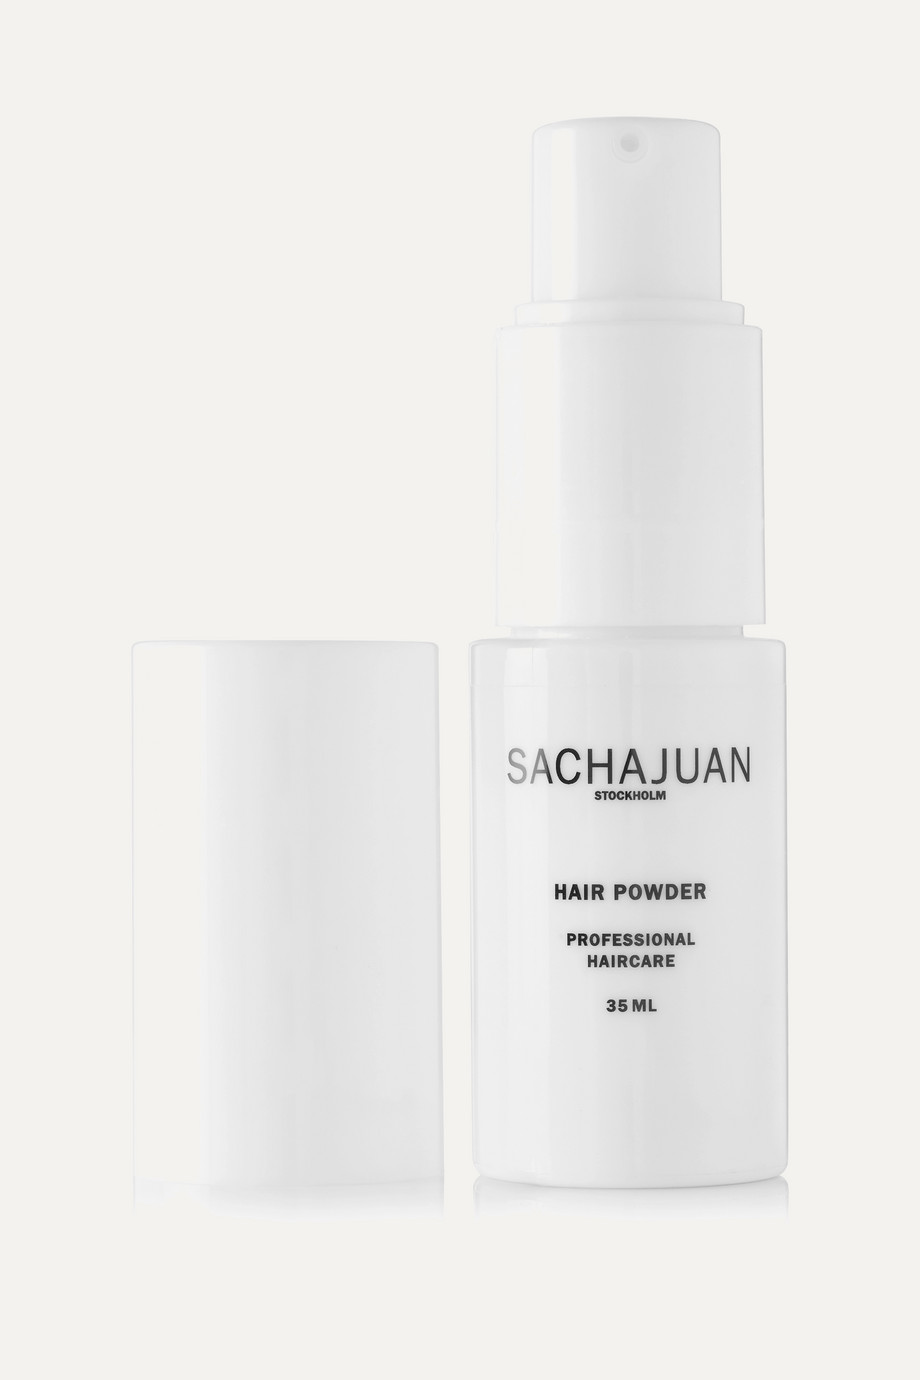 SACHAJUAN Hair Powder, 35ml